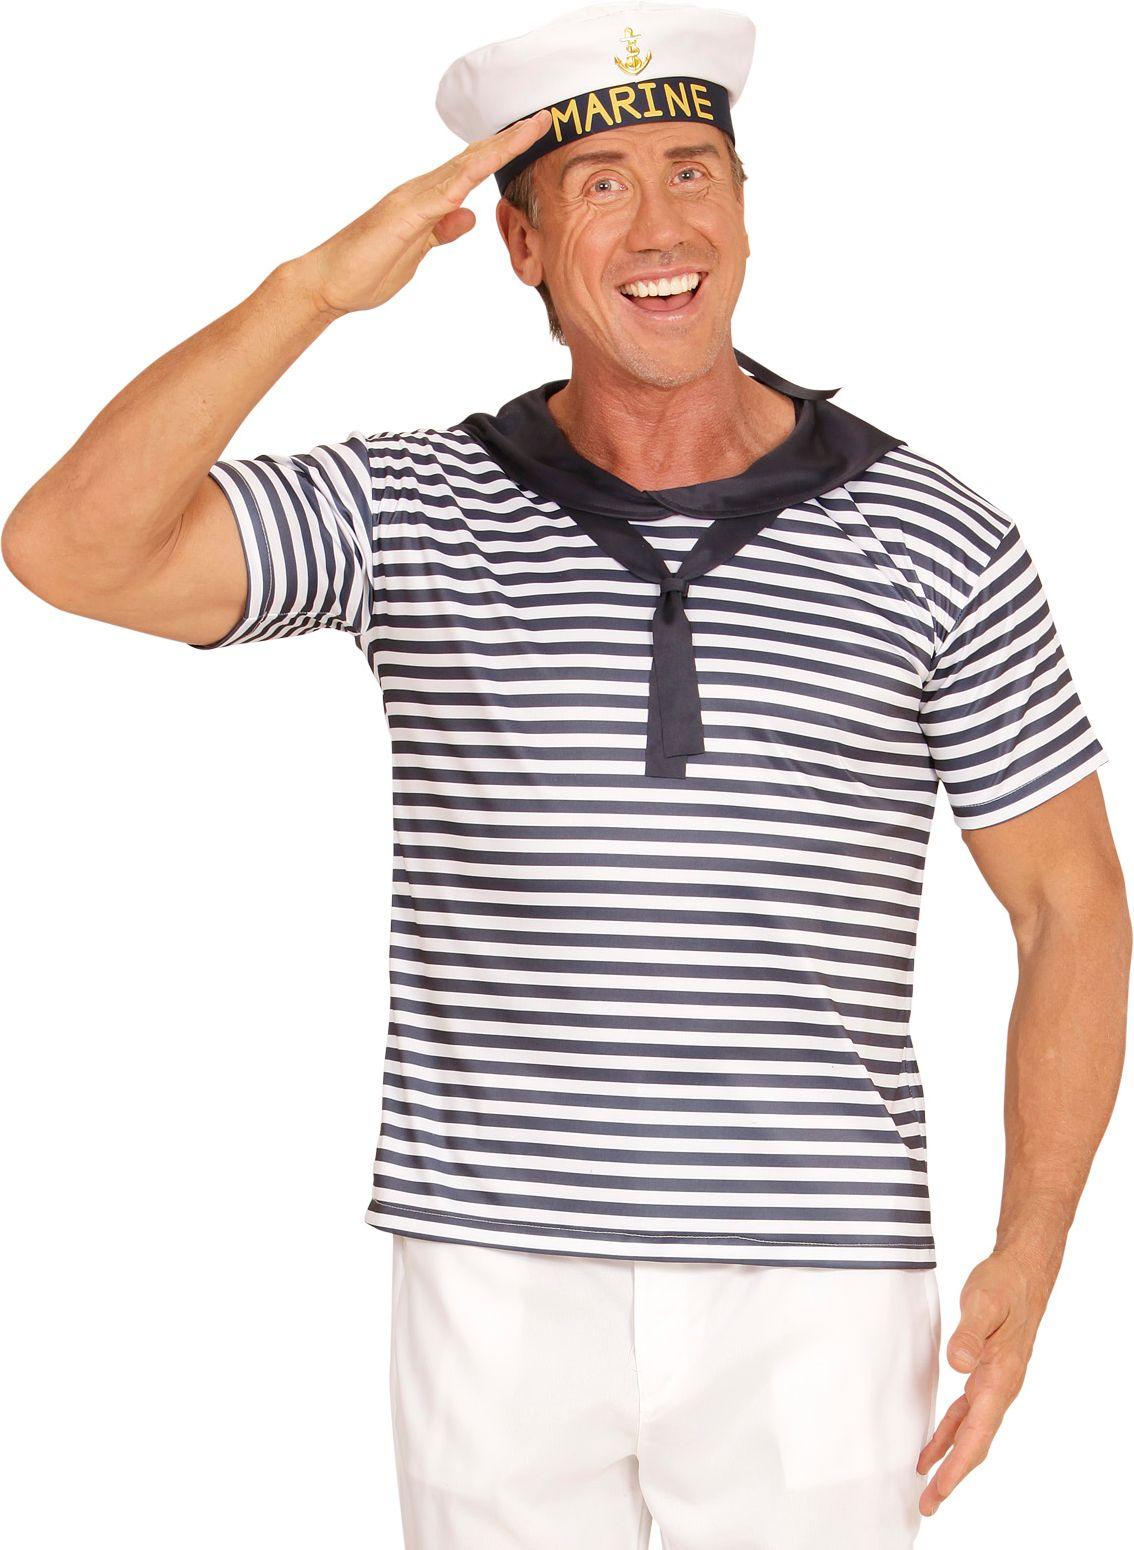 Marine verkleedset